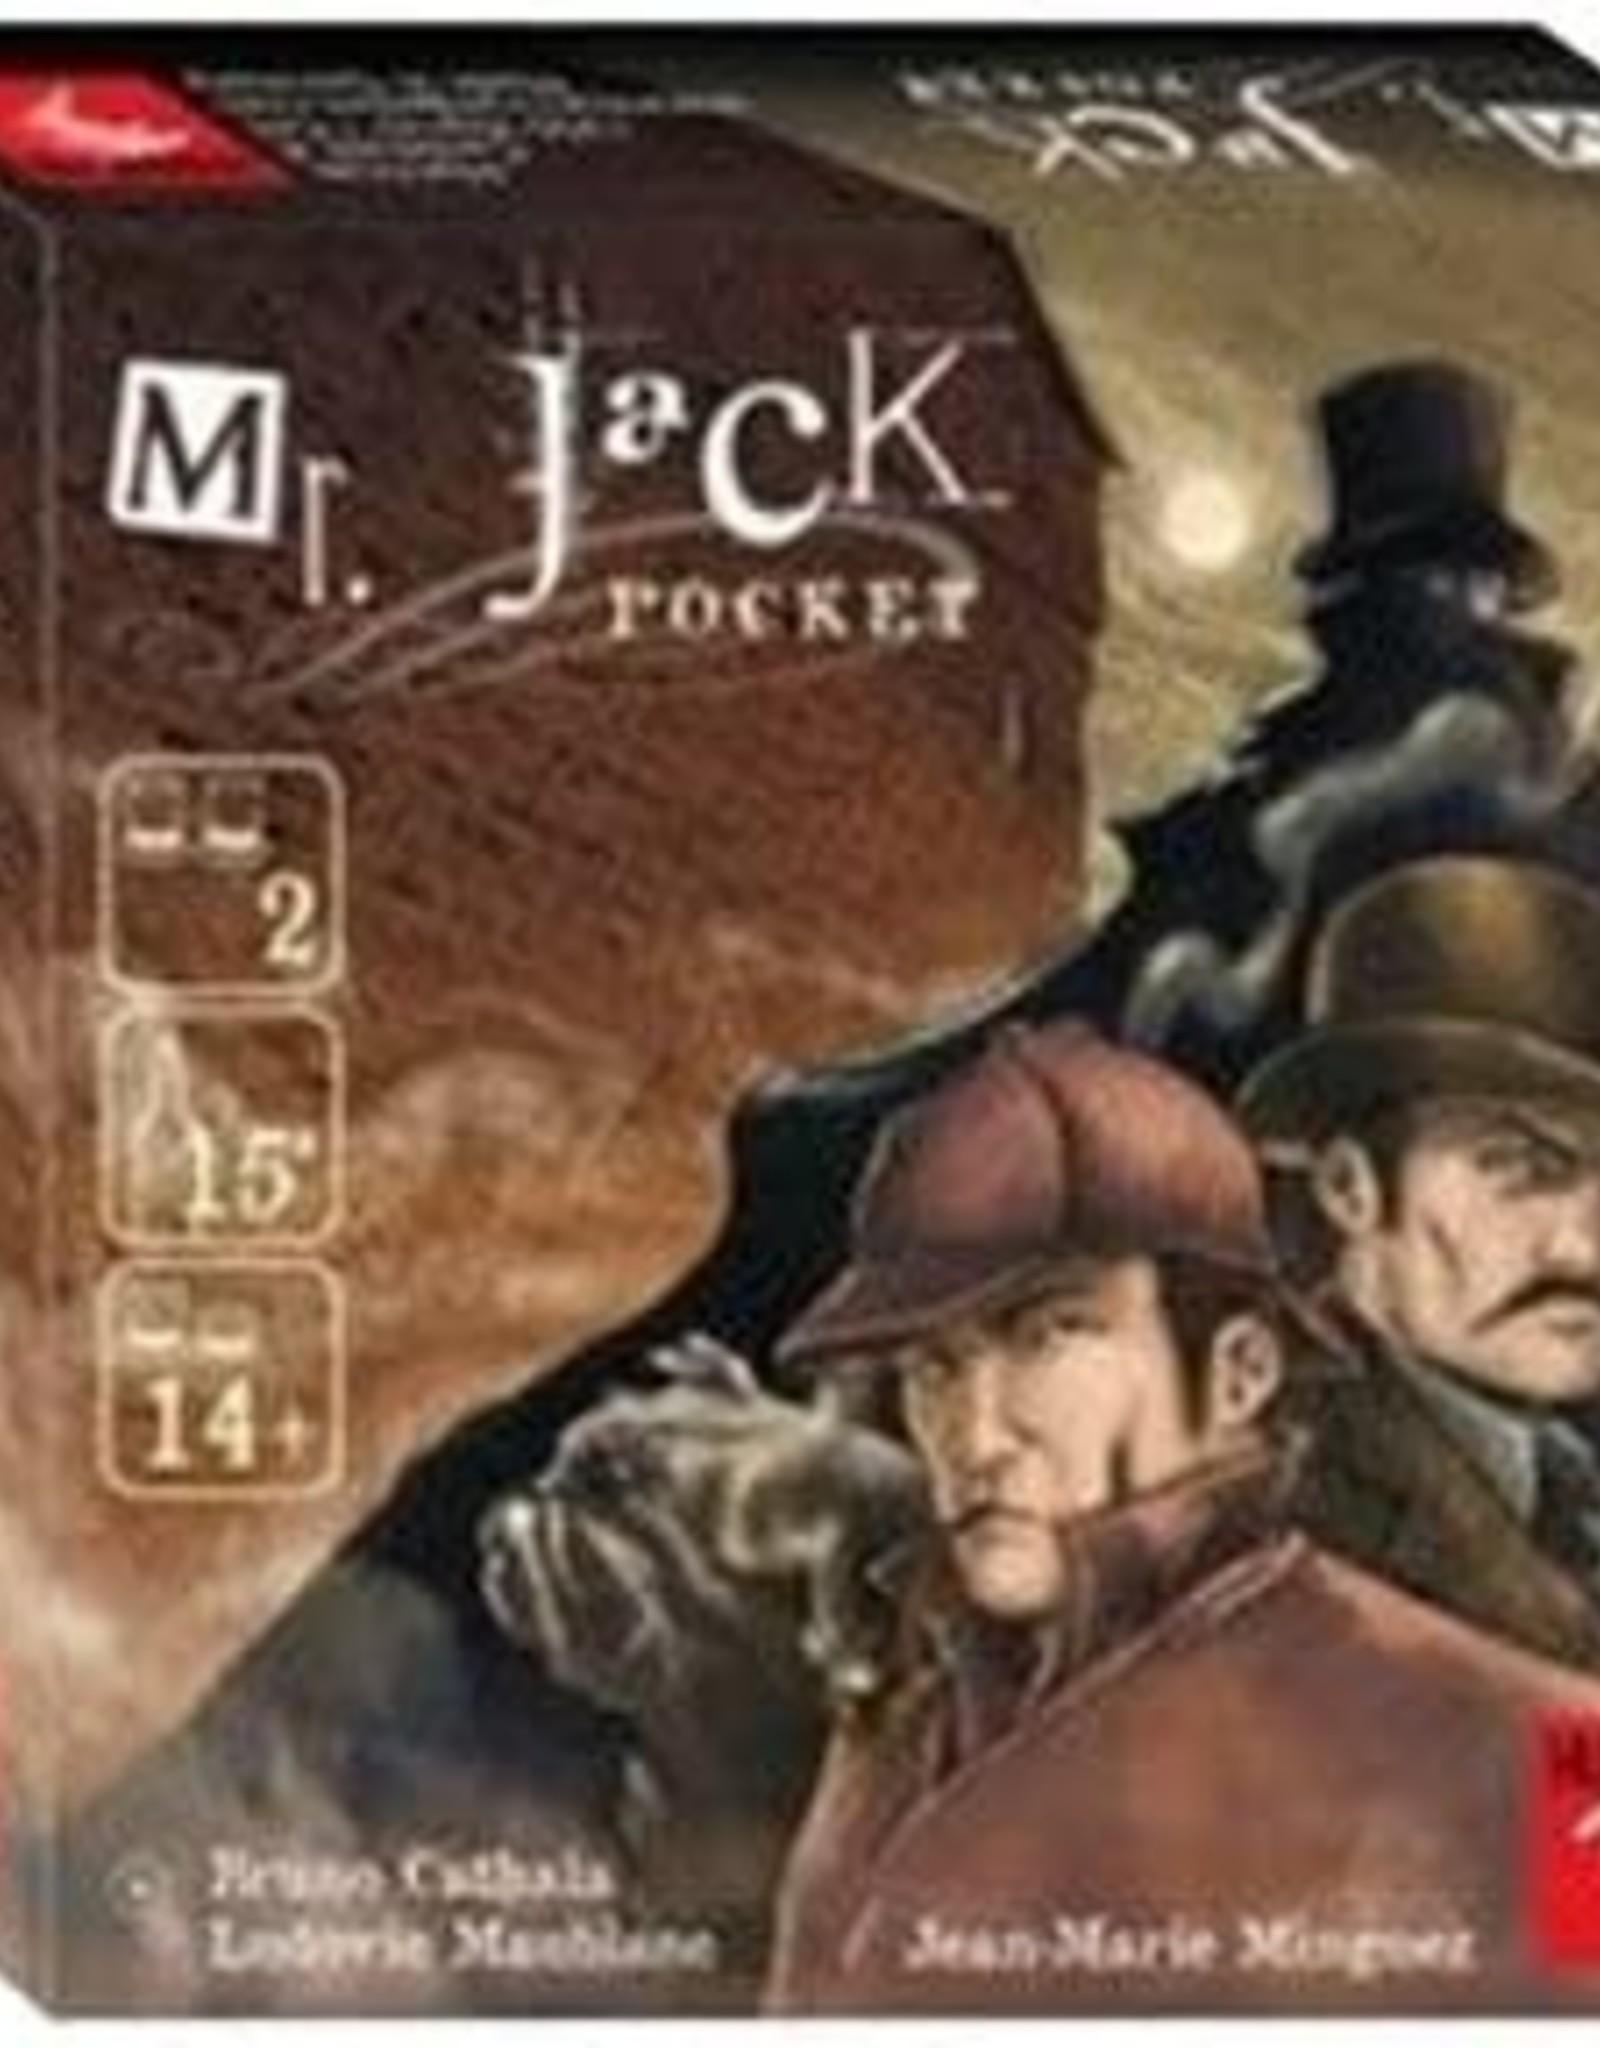 Hurrican Mr. Jack: Pocket